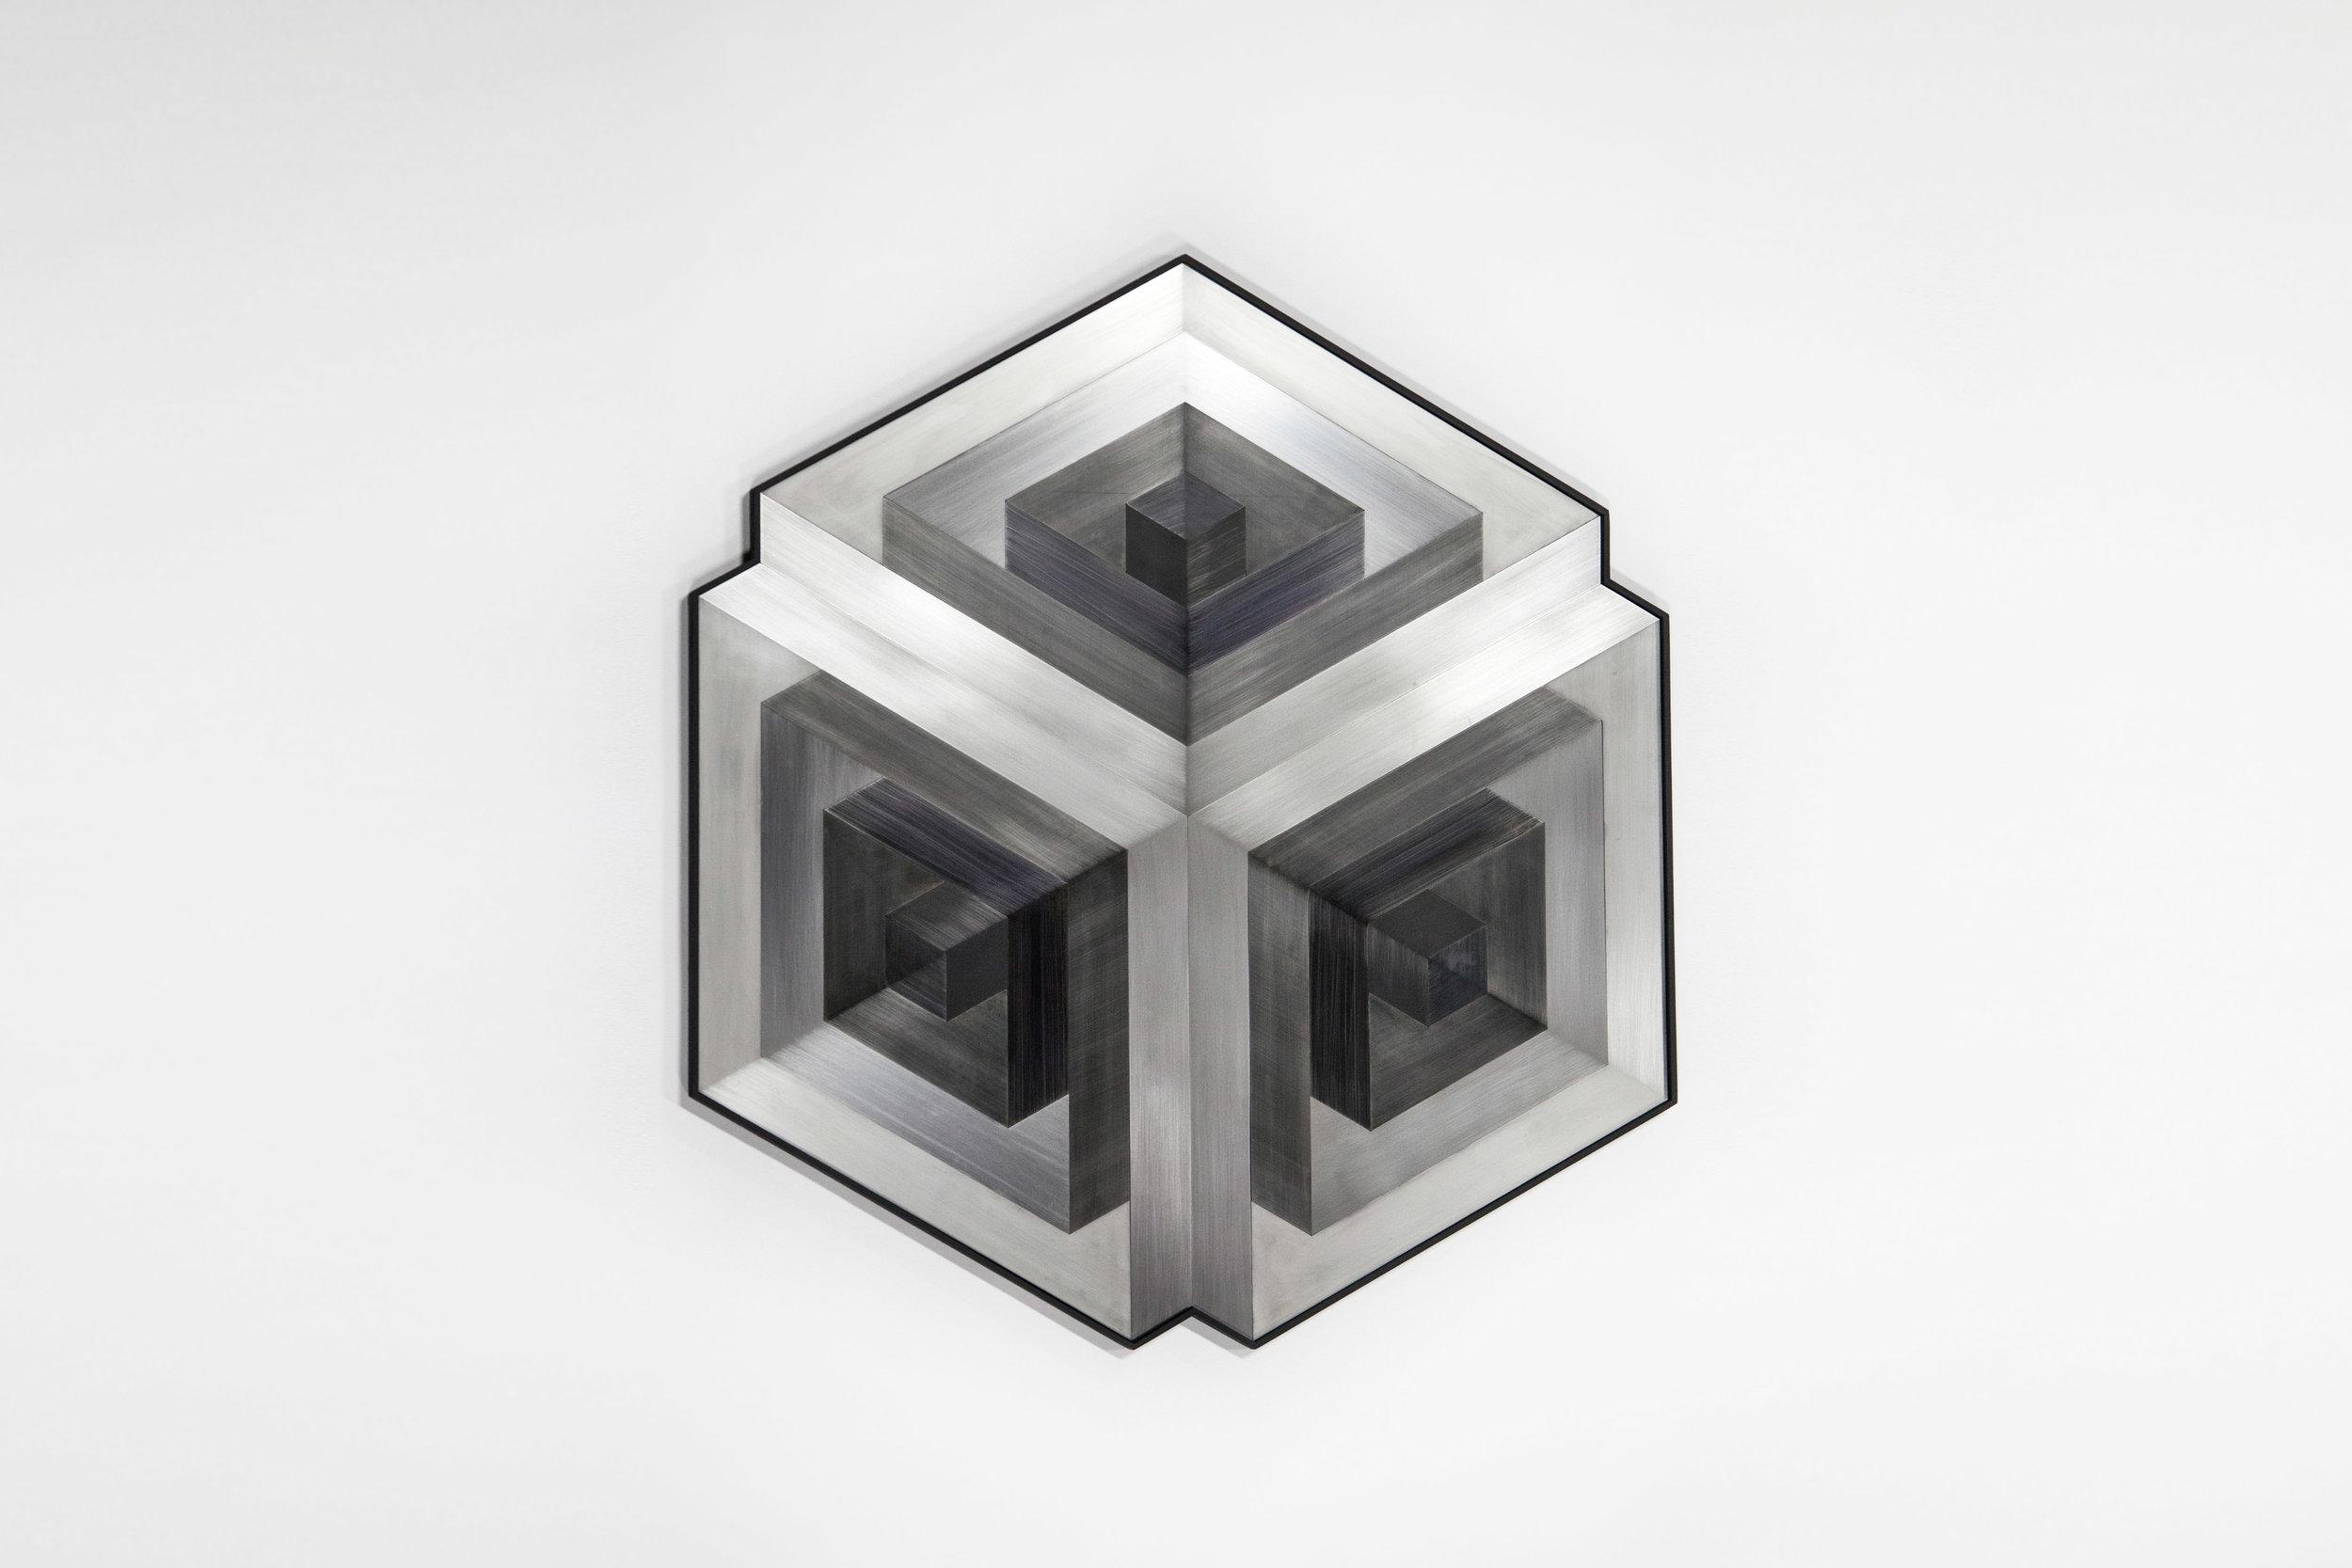 2017-02 Cube Rose No. 2 -1.jpg